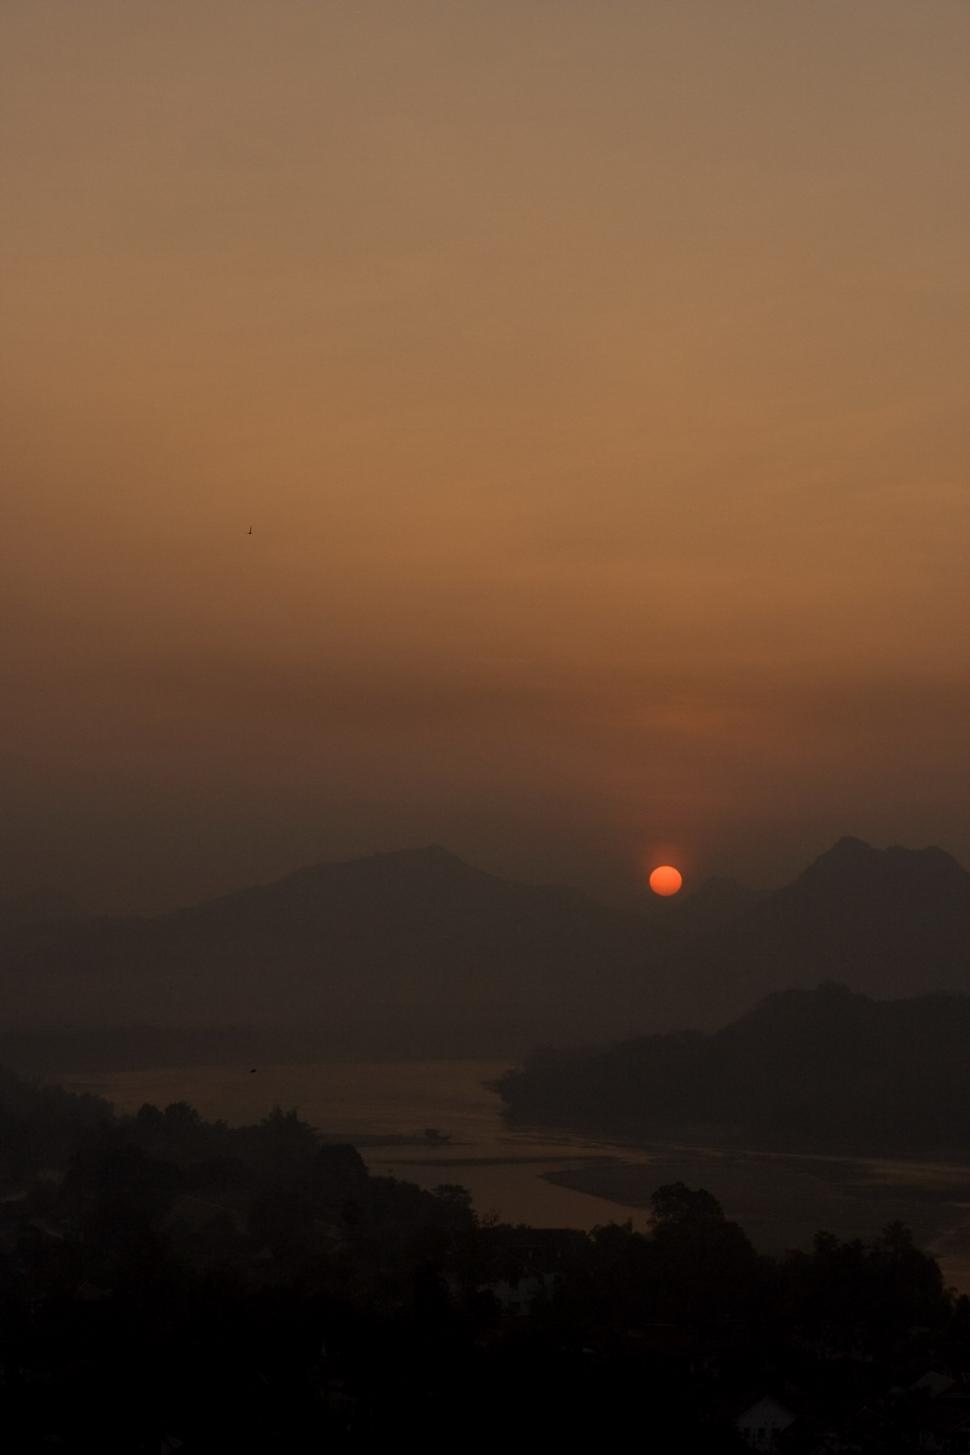 Download Free Stock HD Photo of Sunset in LuangPrabang, Laos Online